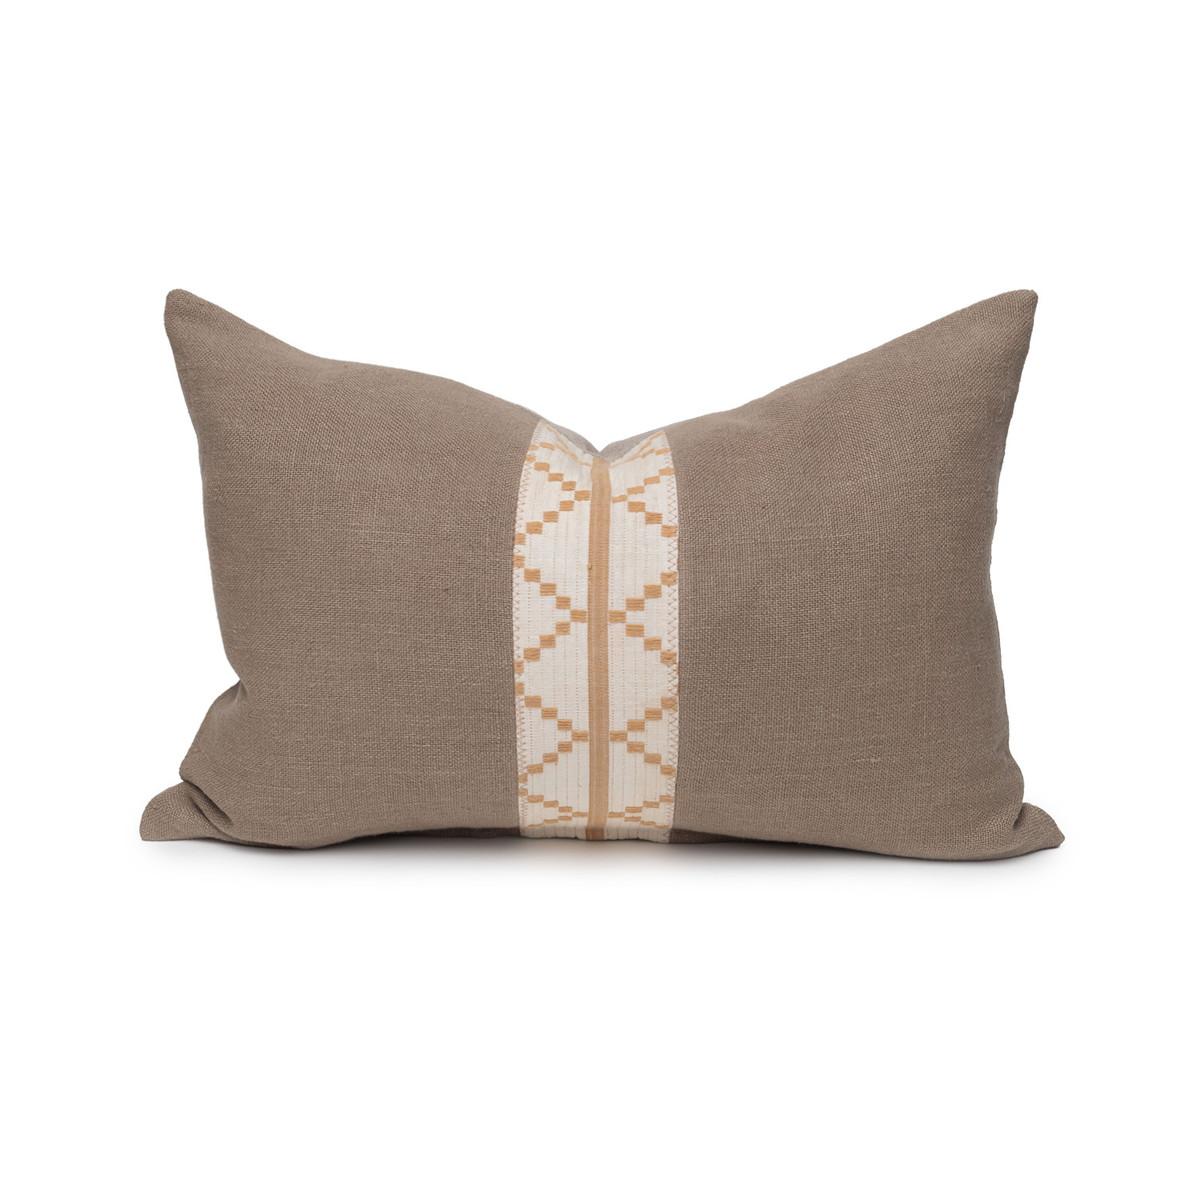 Naldo Lumbar Aso Oke Vintage Textile Pillow - 1420 - Front View